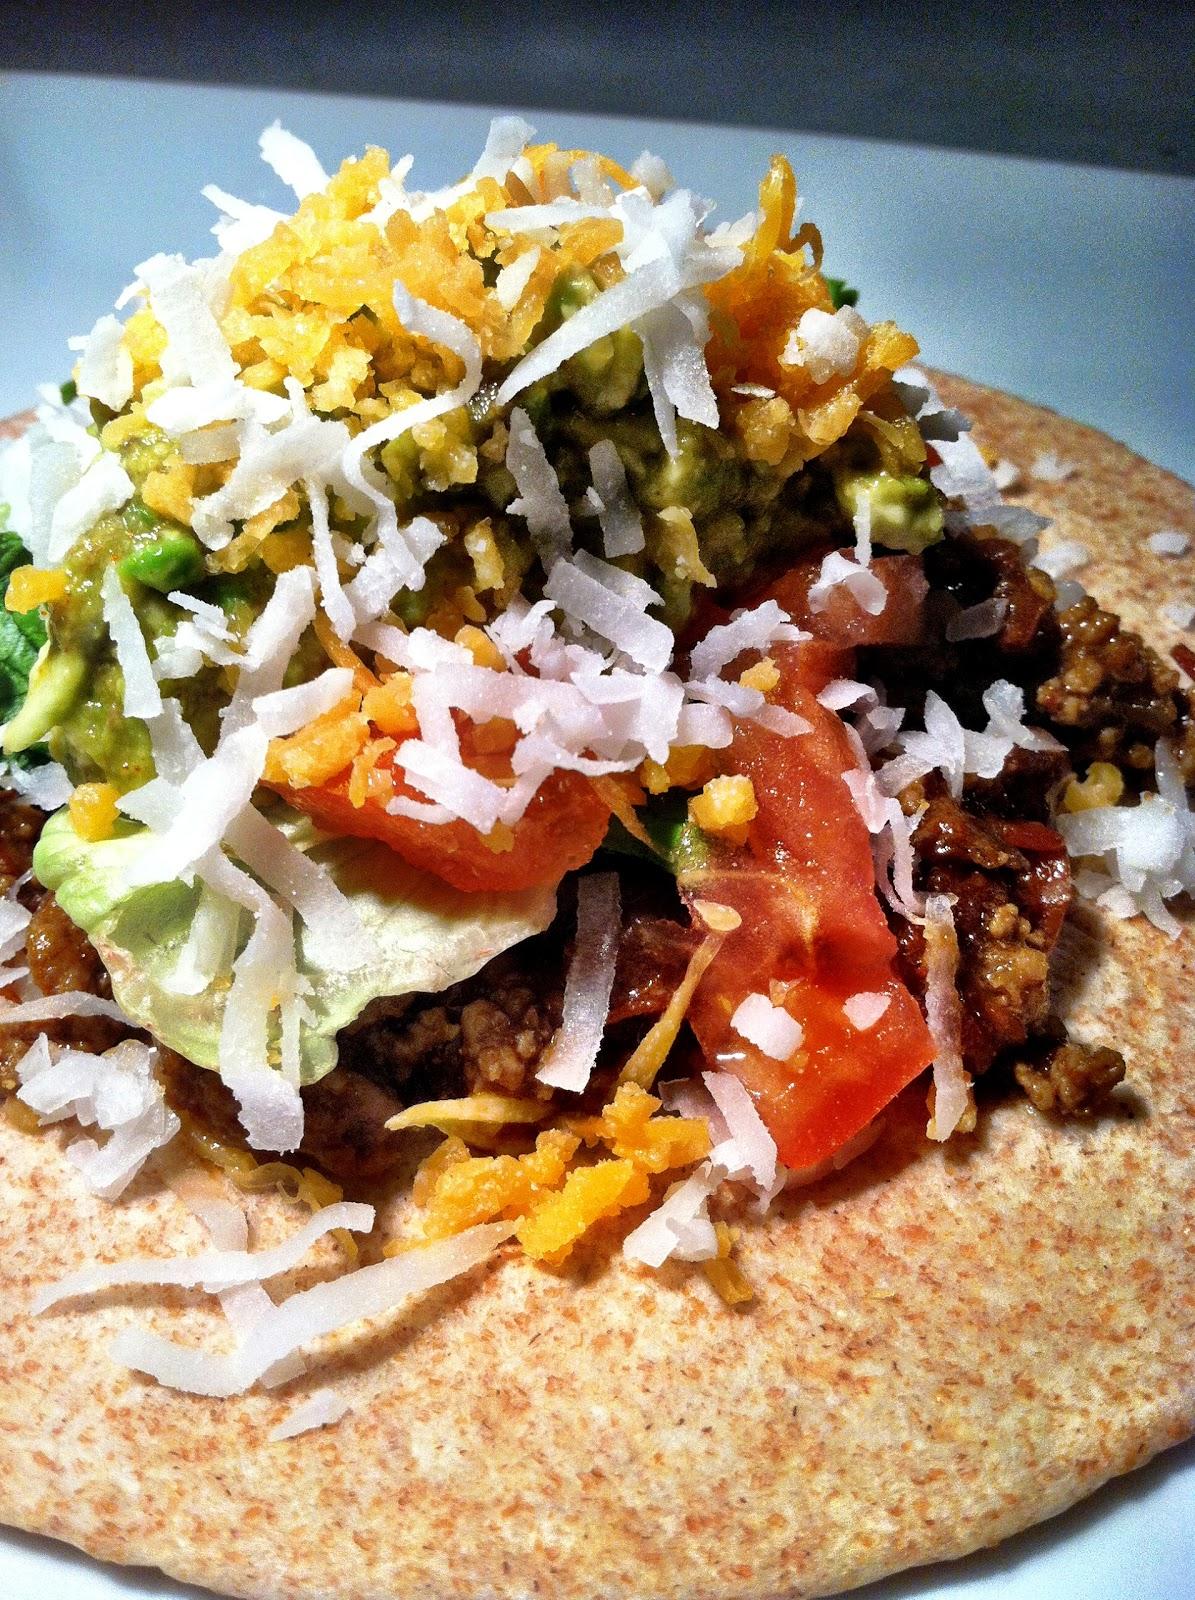 Chipotle & Coconut Beef Tacos